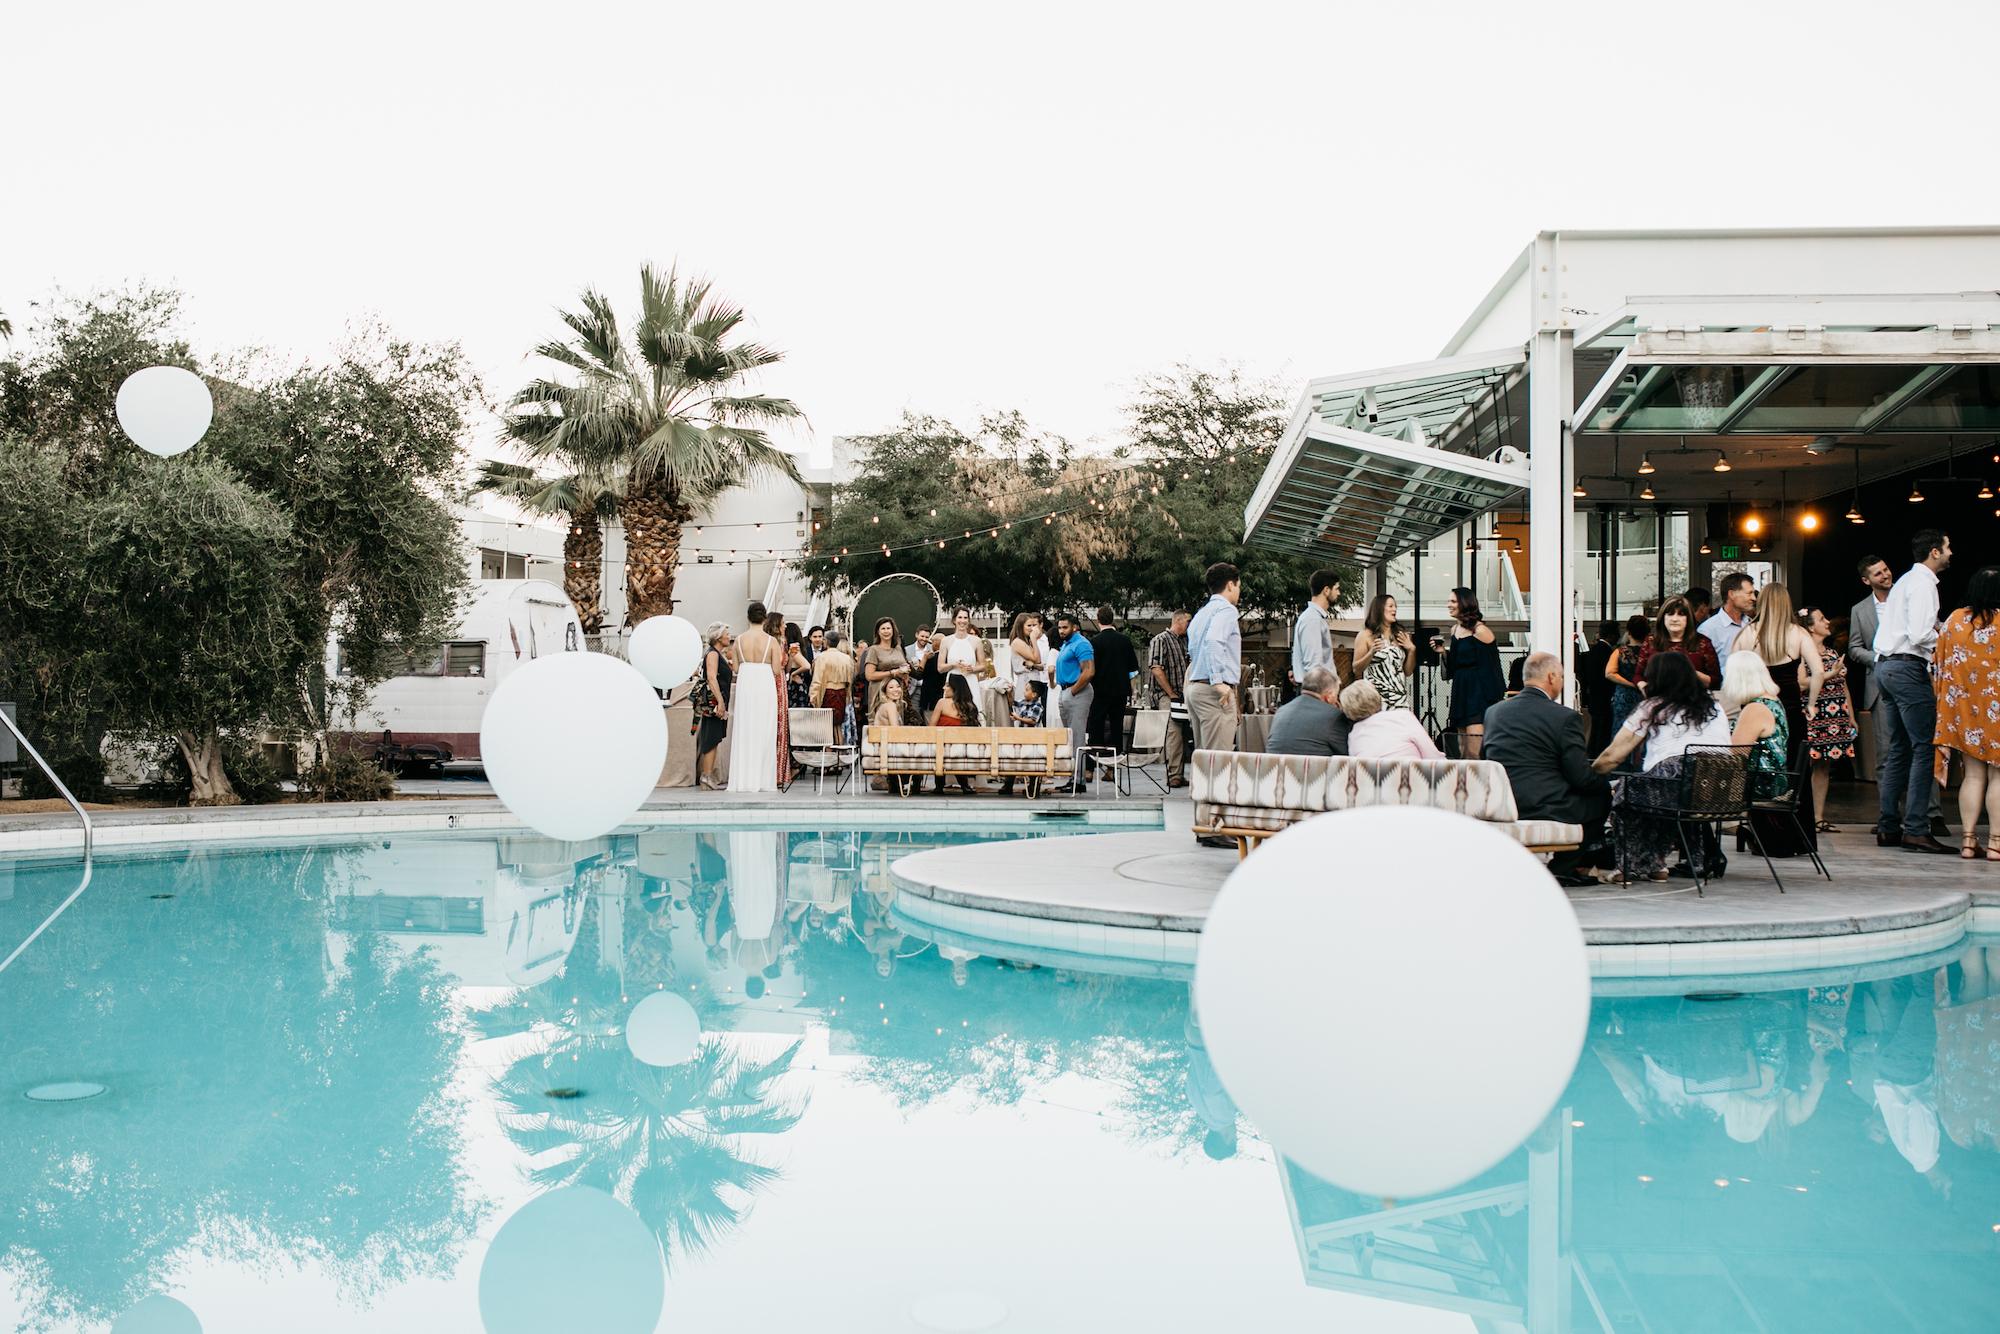 ace-hotel-palm-springs-wedding-photographer692.jpg